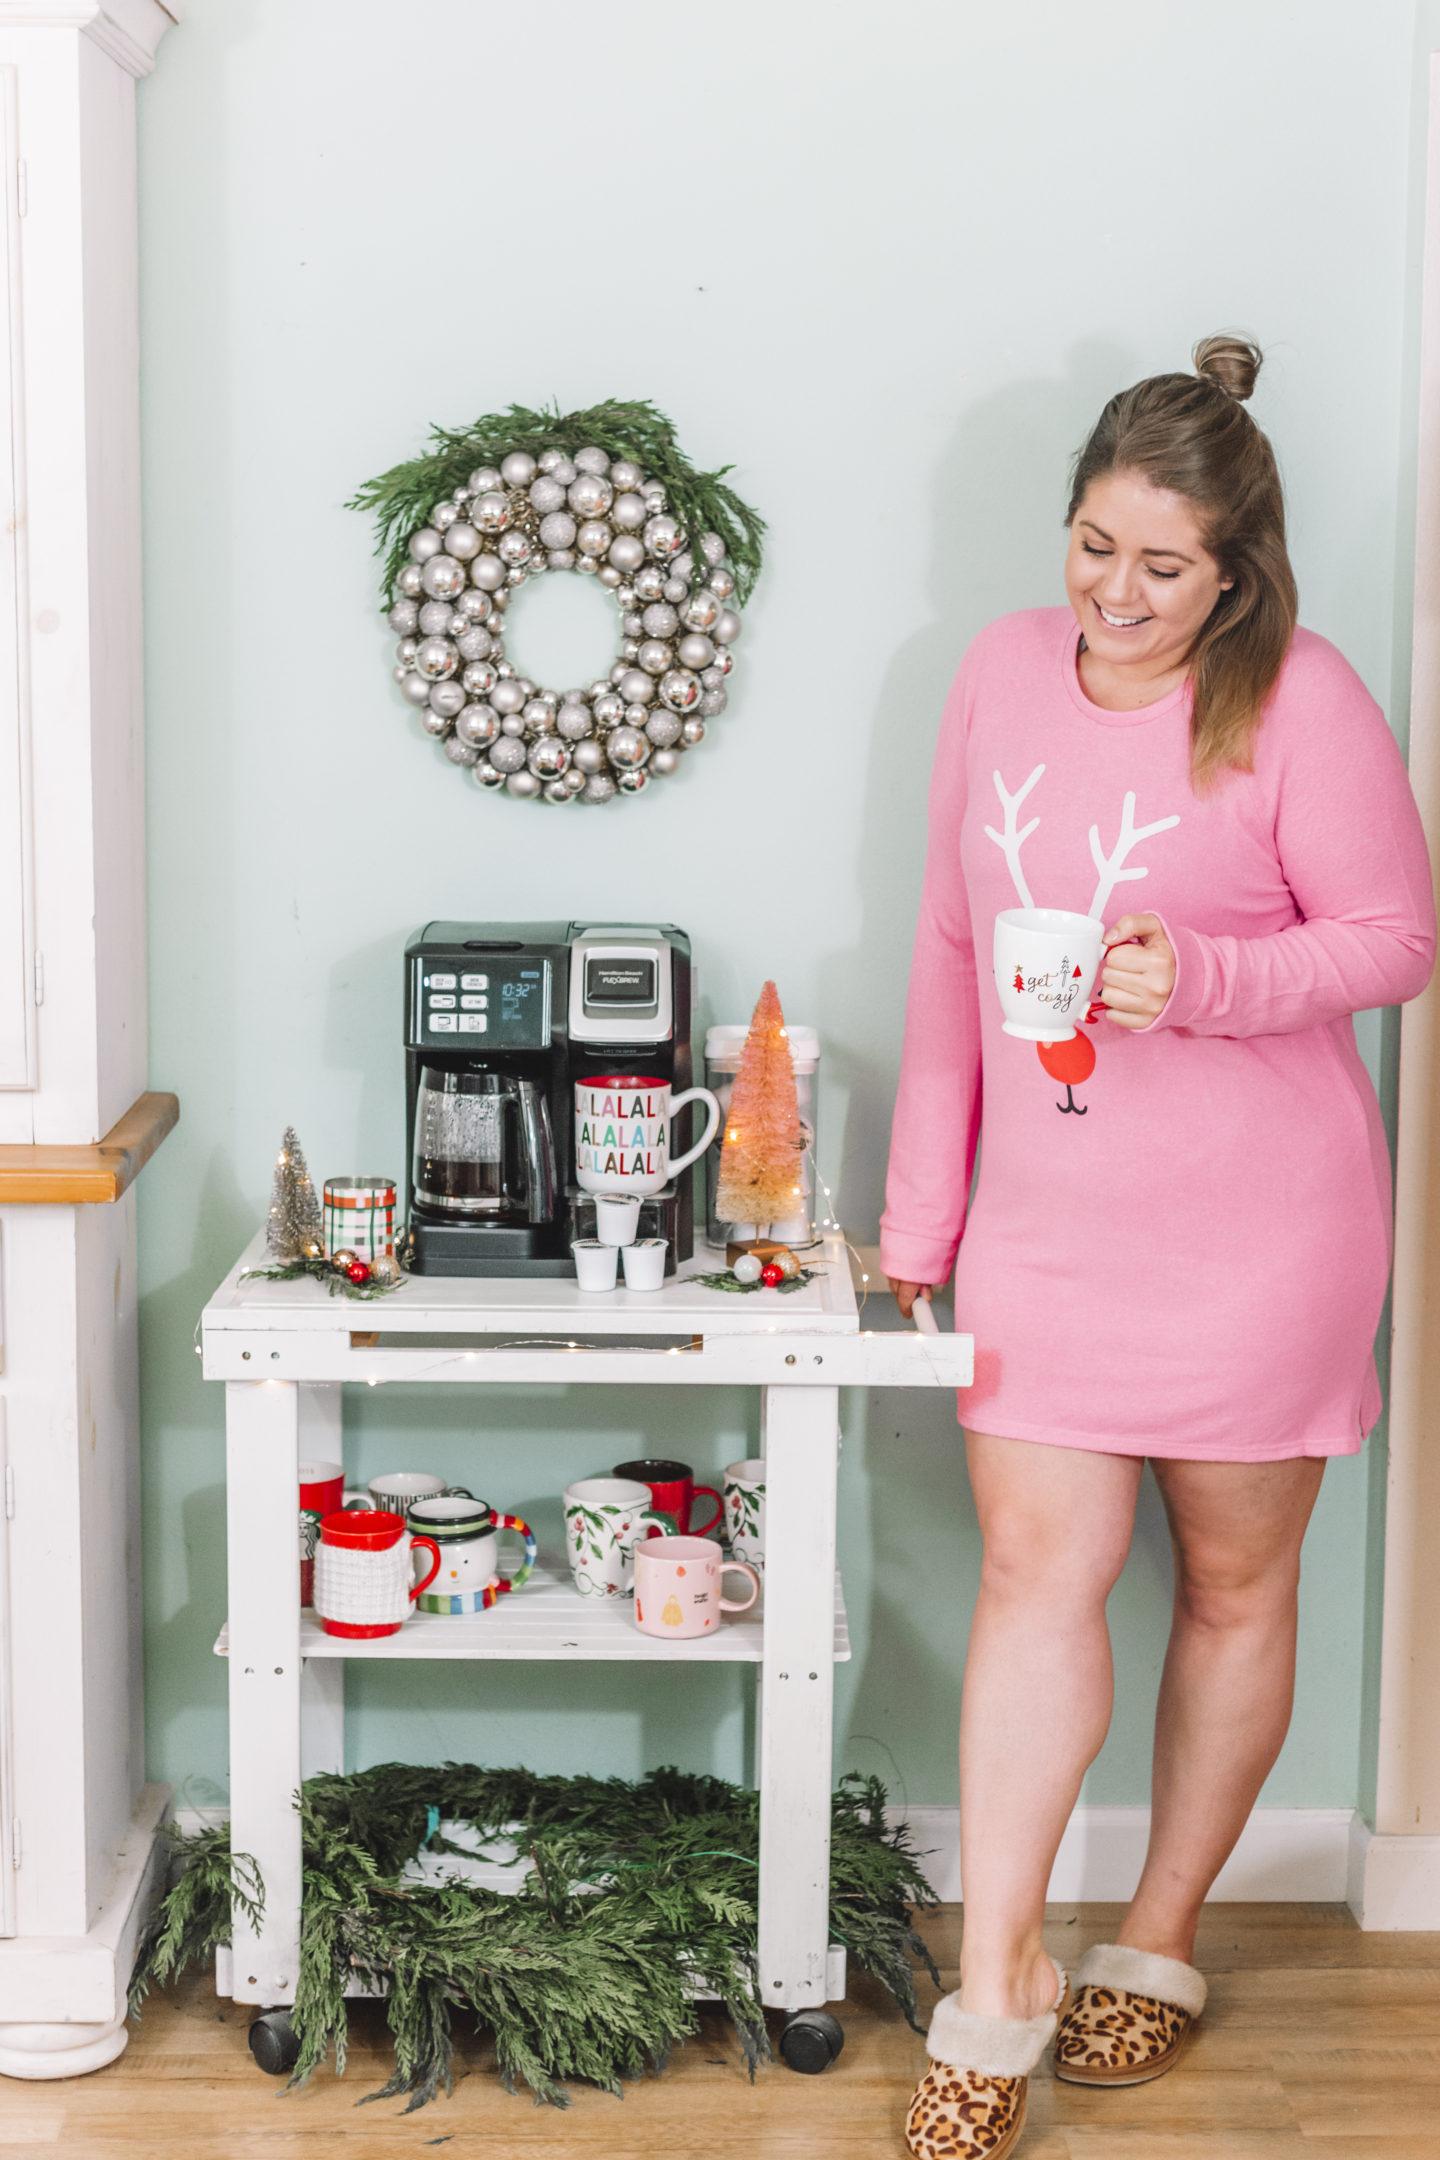 Brewing Up Holiday Cheer with Hamilton Beach - Christmas coffee bar